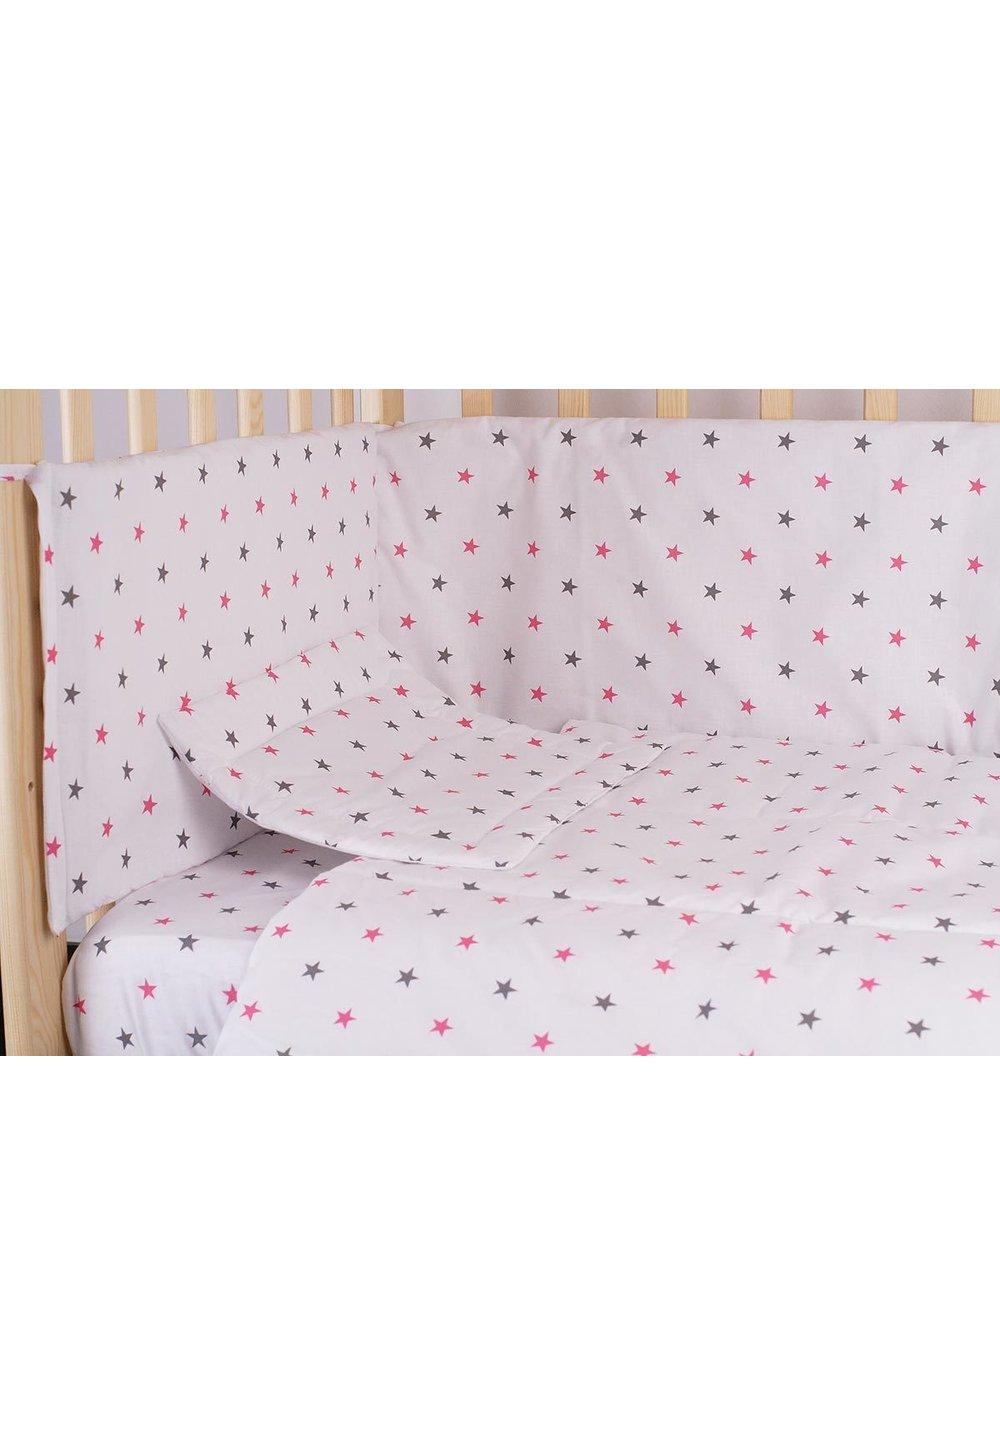 Lenjerie alba,stelute roz cu gri,5 piese, 140x70 cm imagine